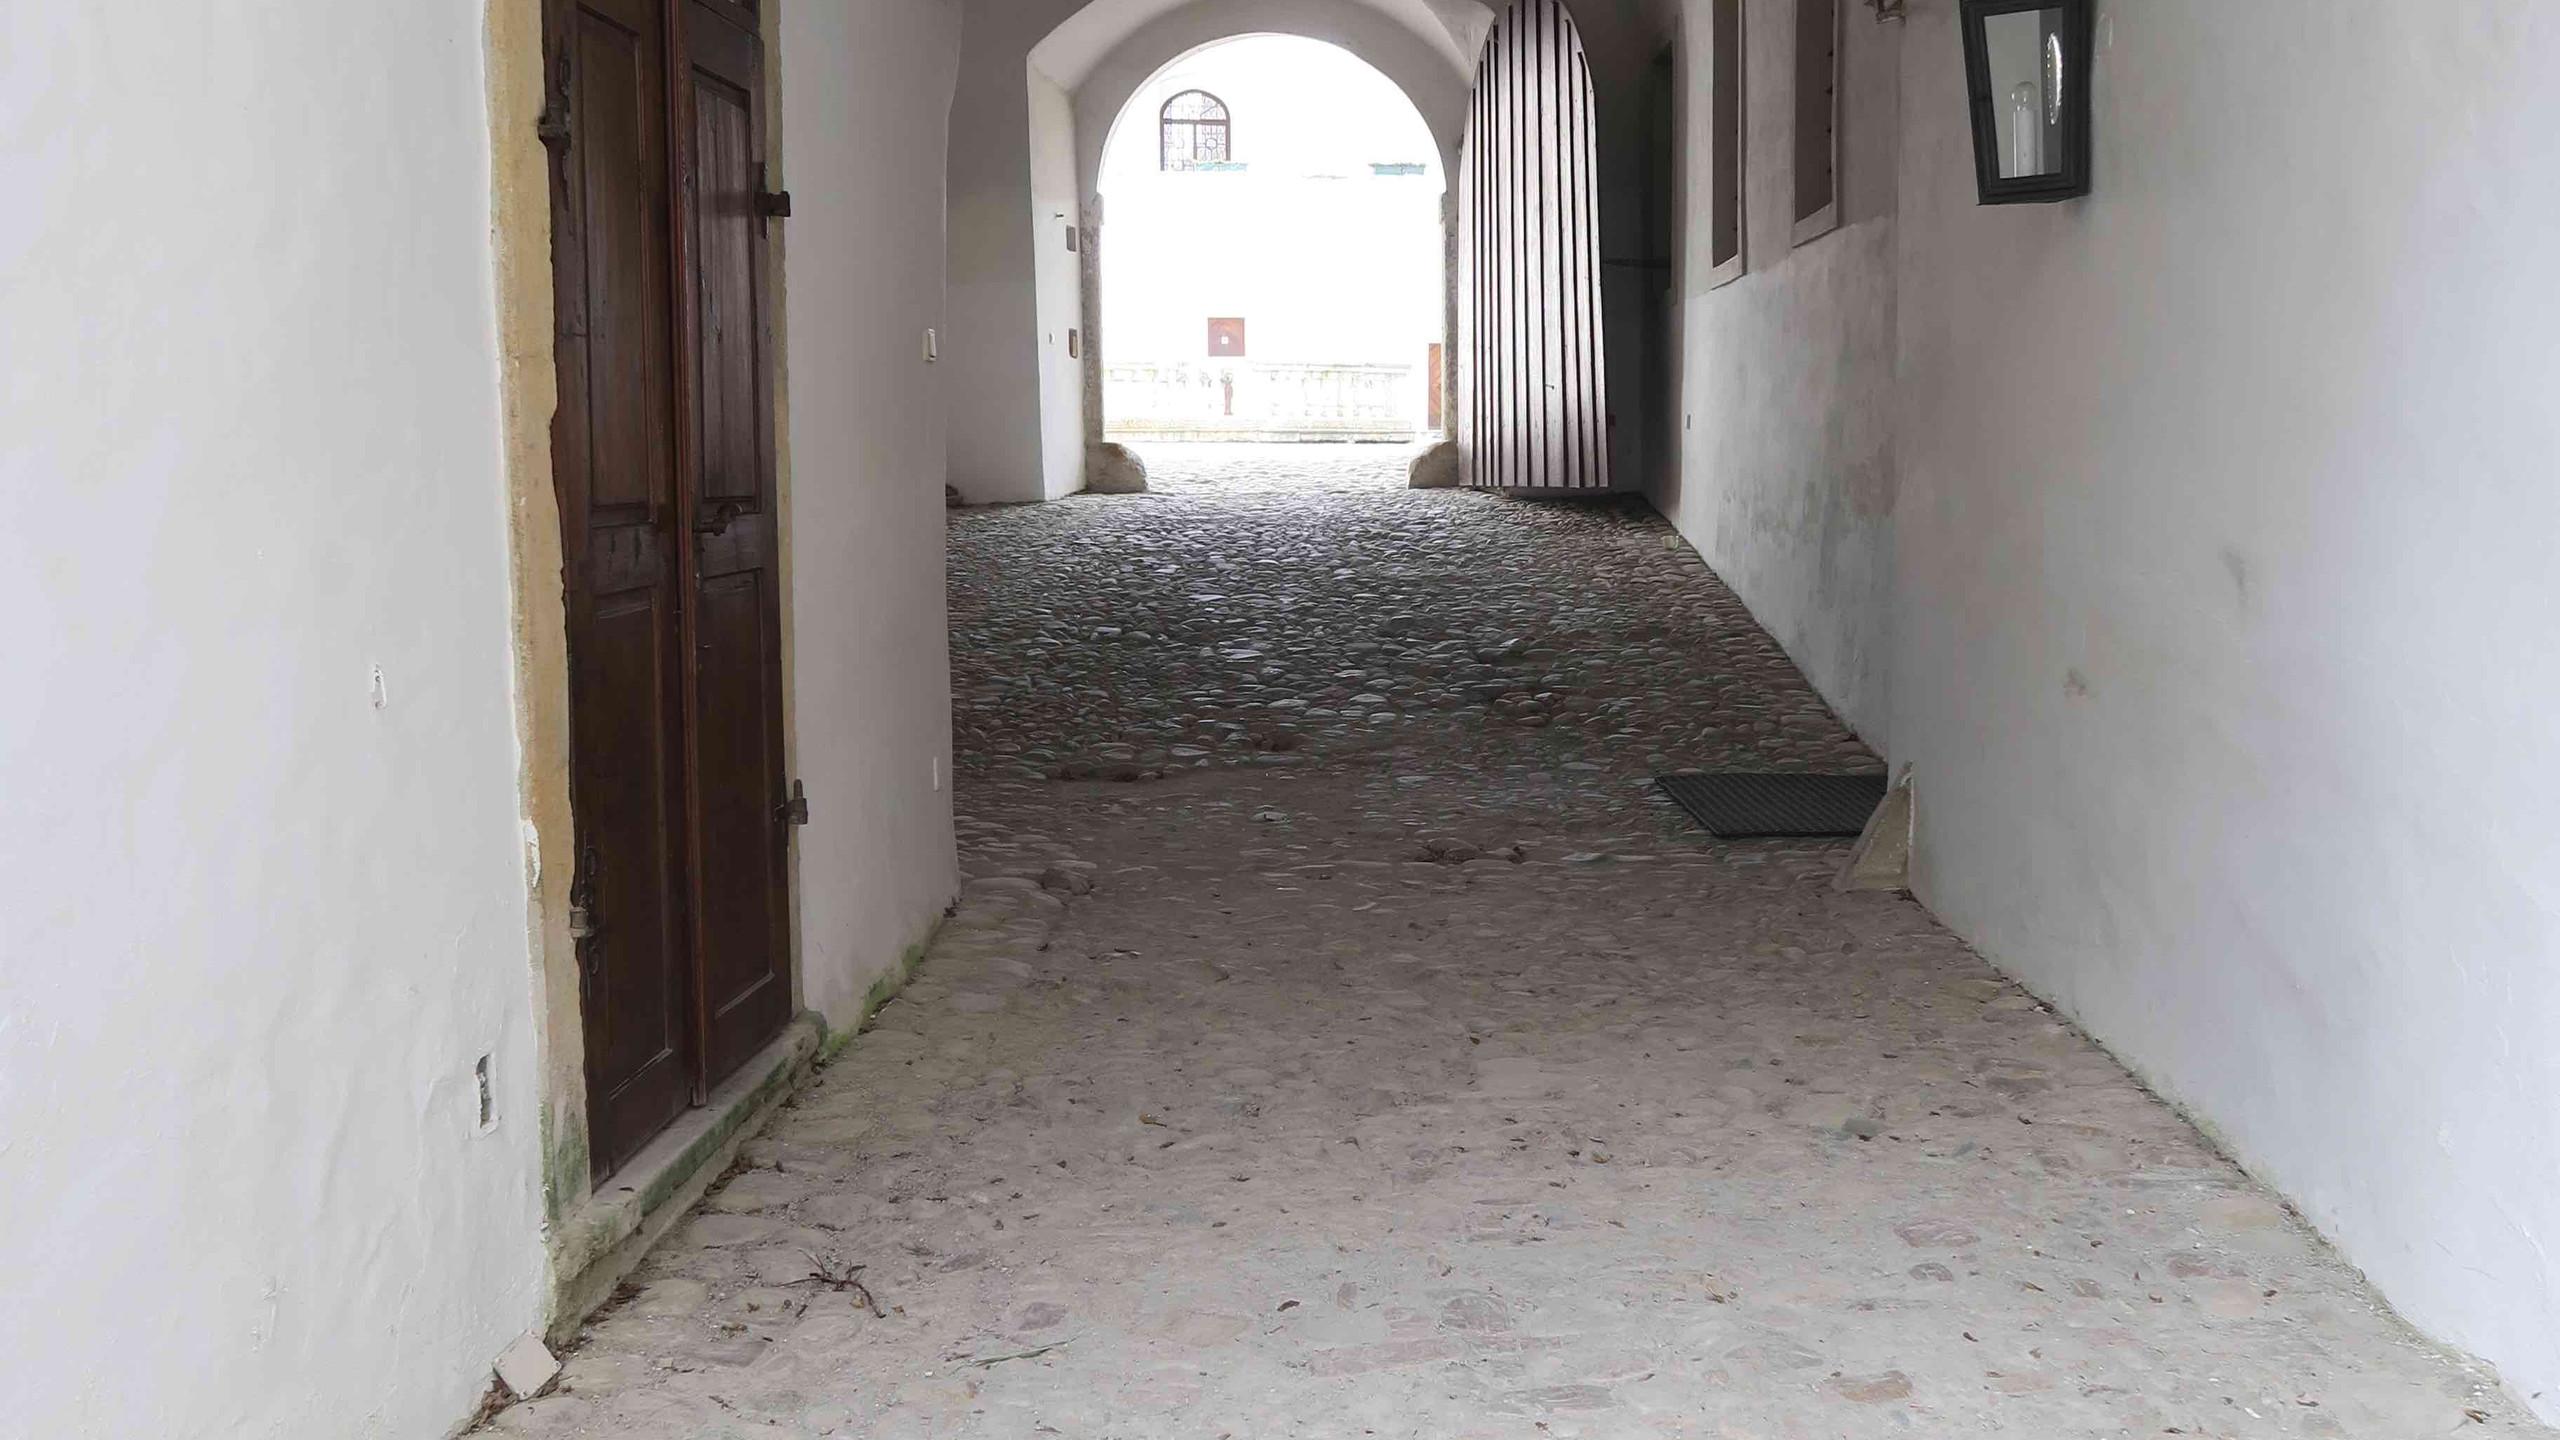 IMG_1645 Schloss Herberstein Austria 2017 Wilhelm W. Kohl kopie